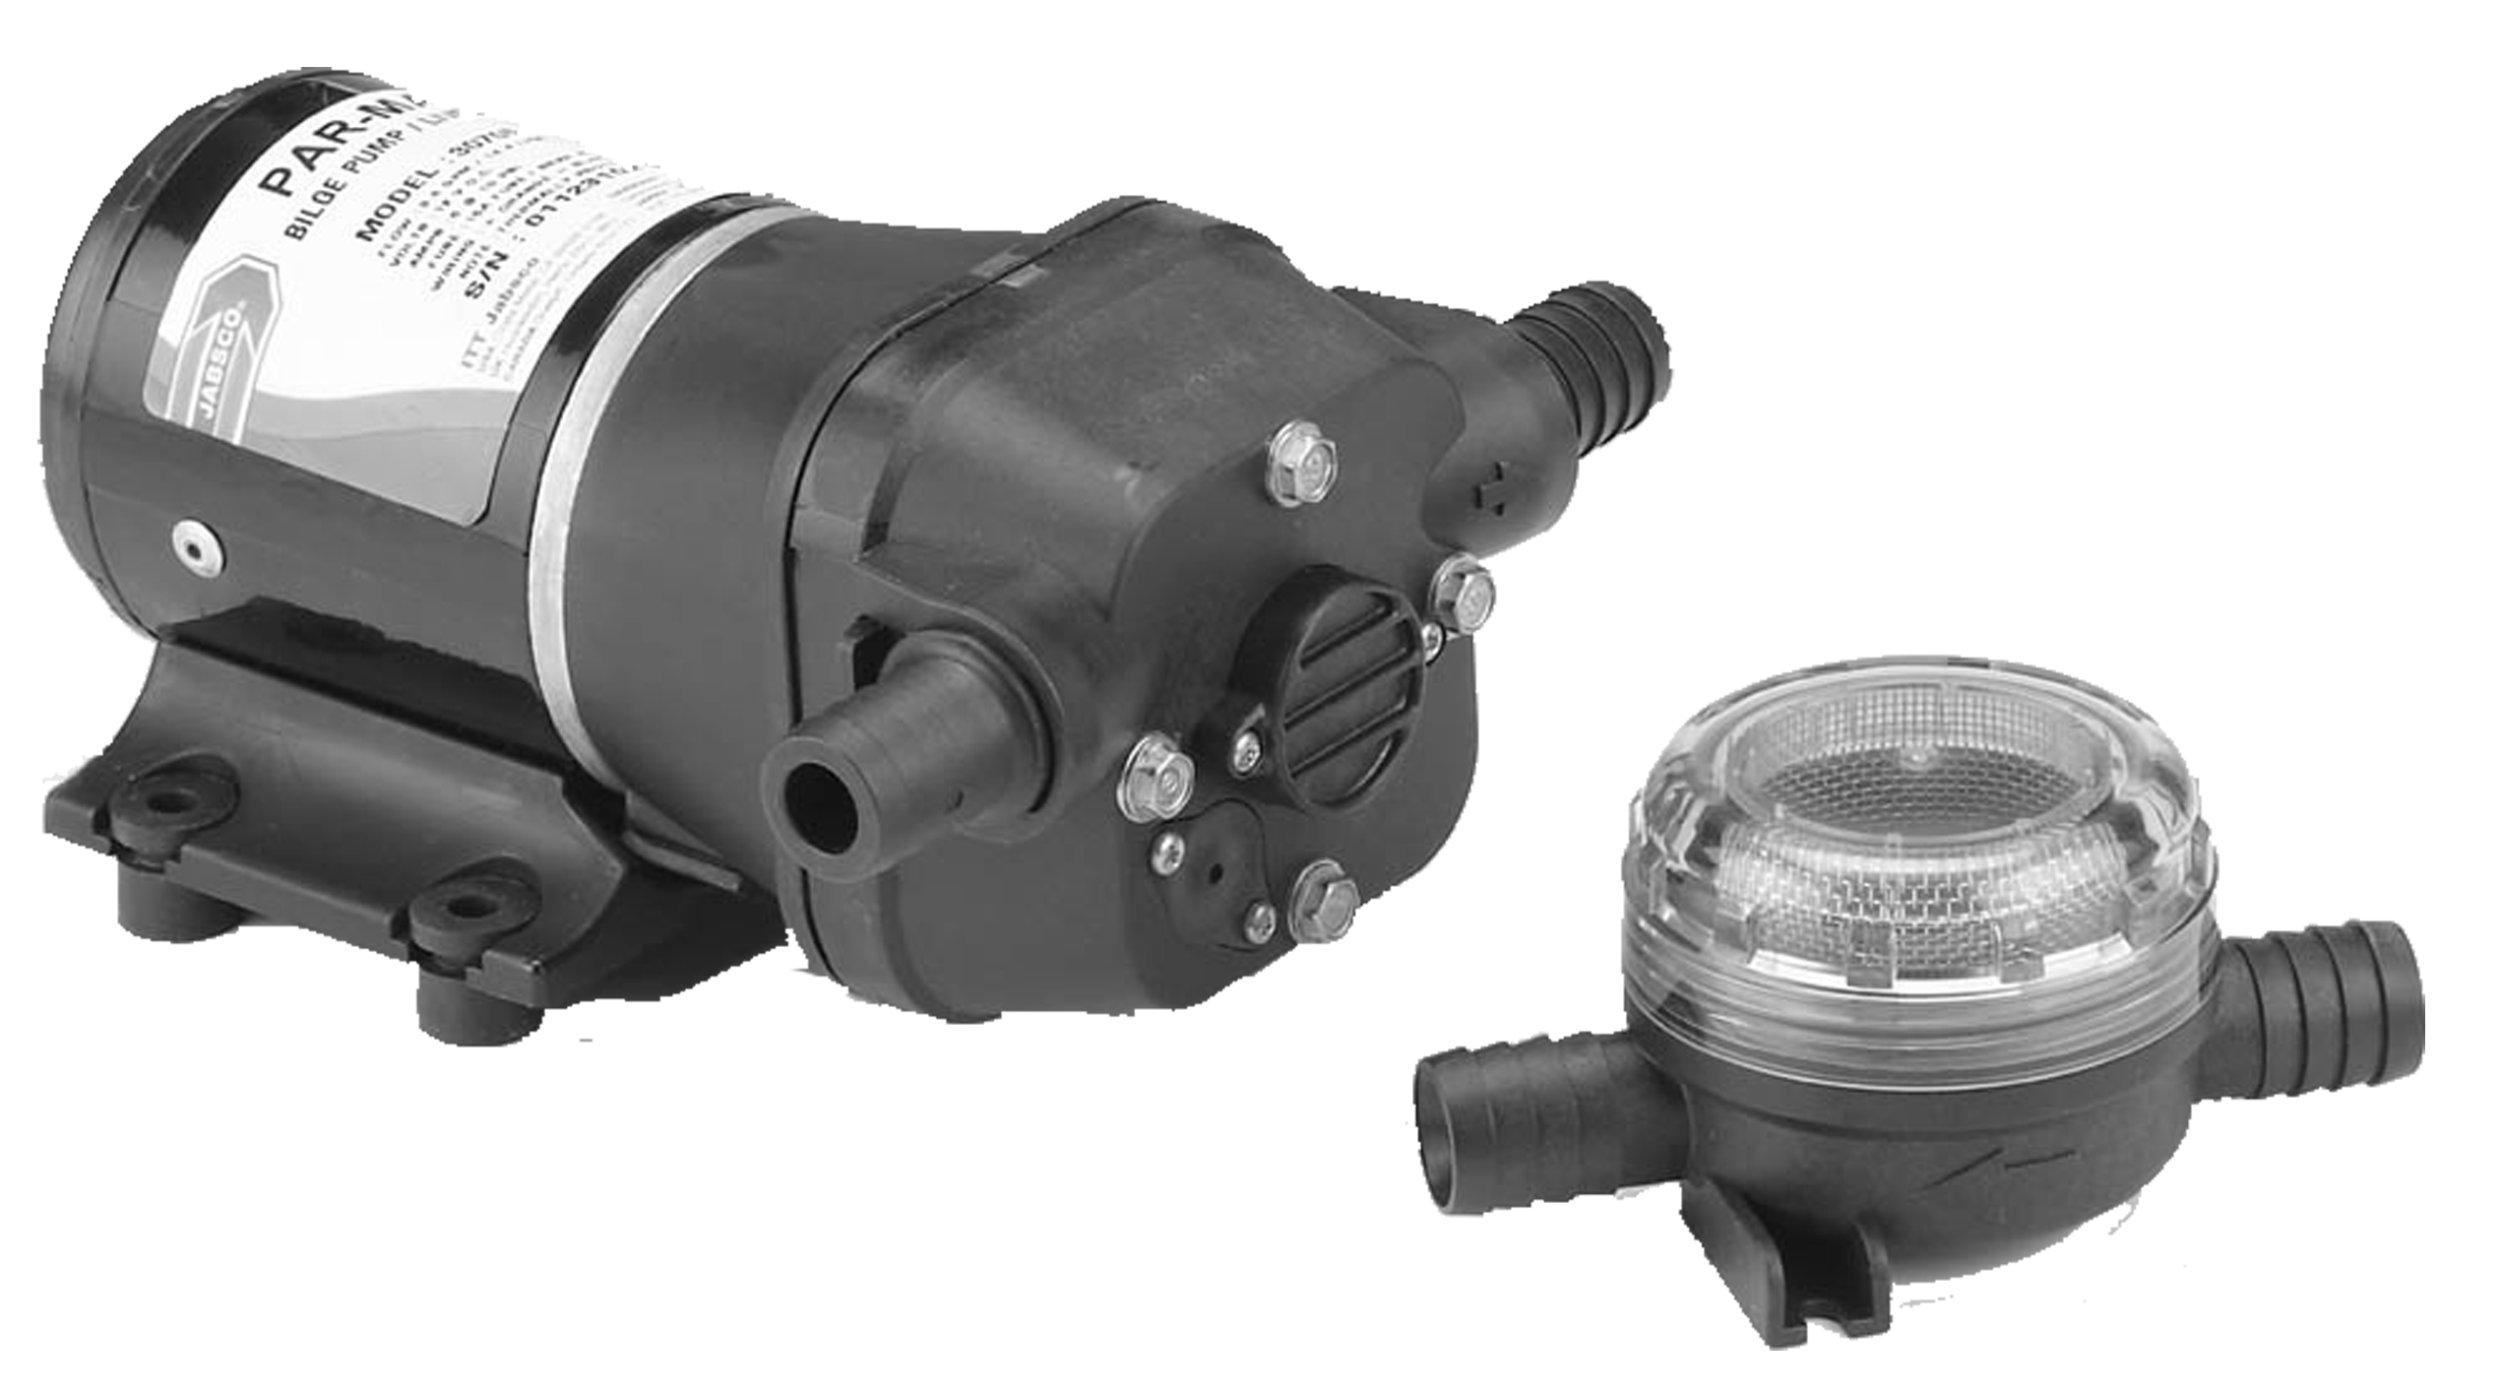 Jabsco 31610-0094 Marine ParMax 3 Shower Drain Water Pump (3.5-GPM, 24-Volt, 7-Amp, 3/4'' Connection)